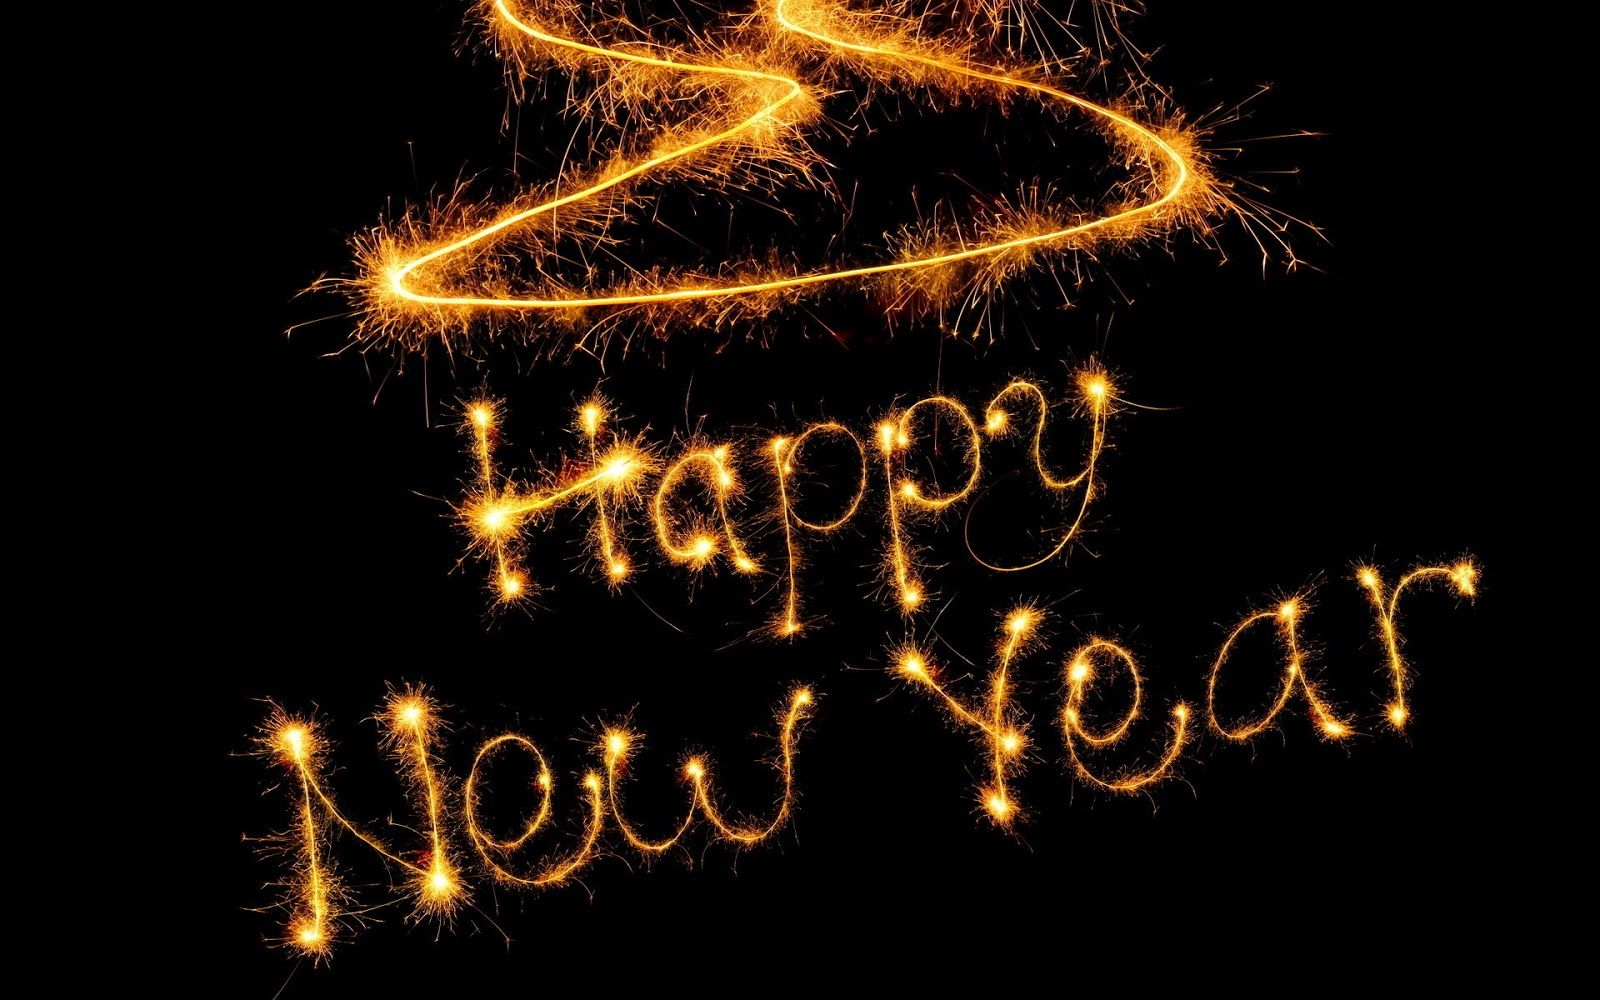 HD Wallpaper Free Download Happy New Year 2013 HD